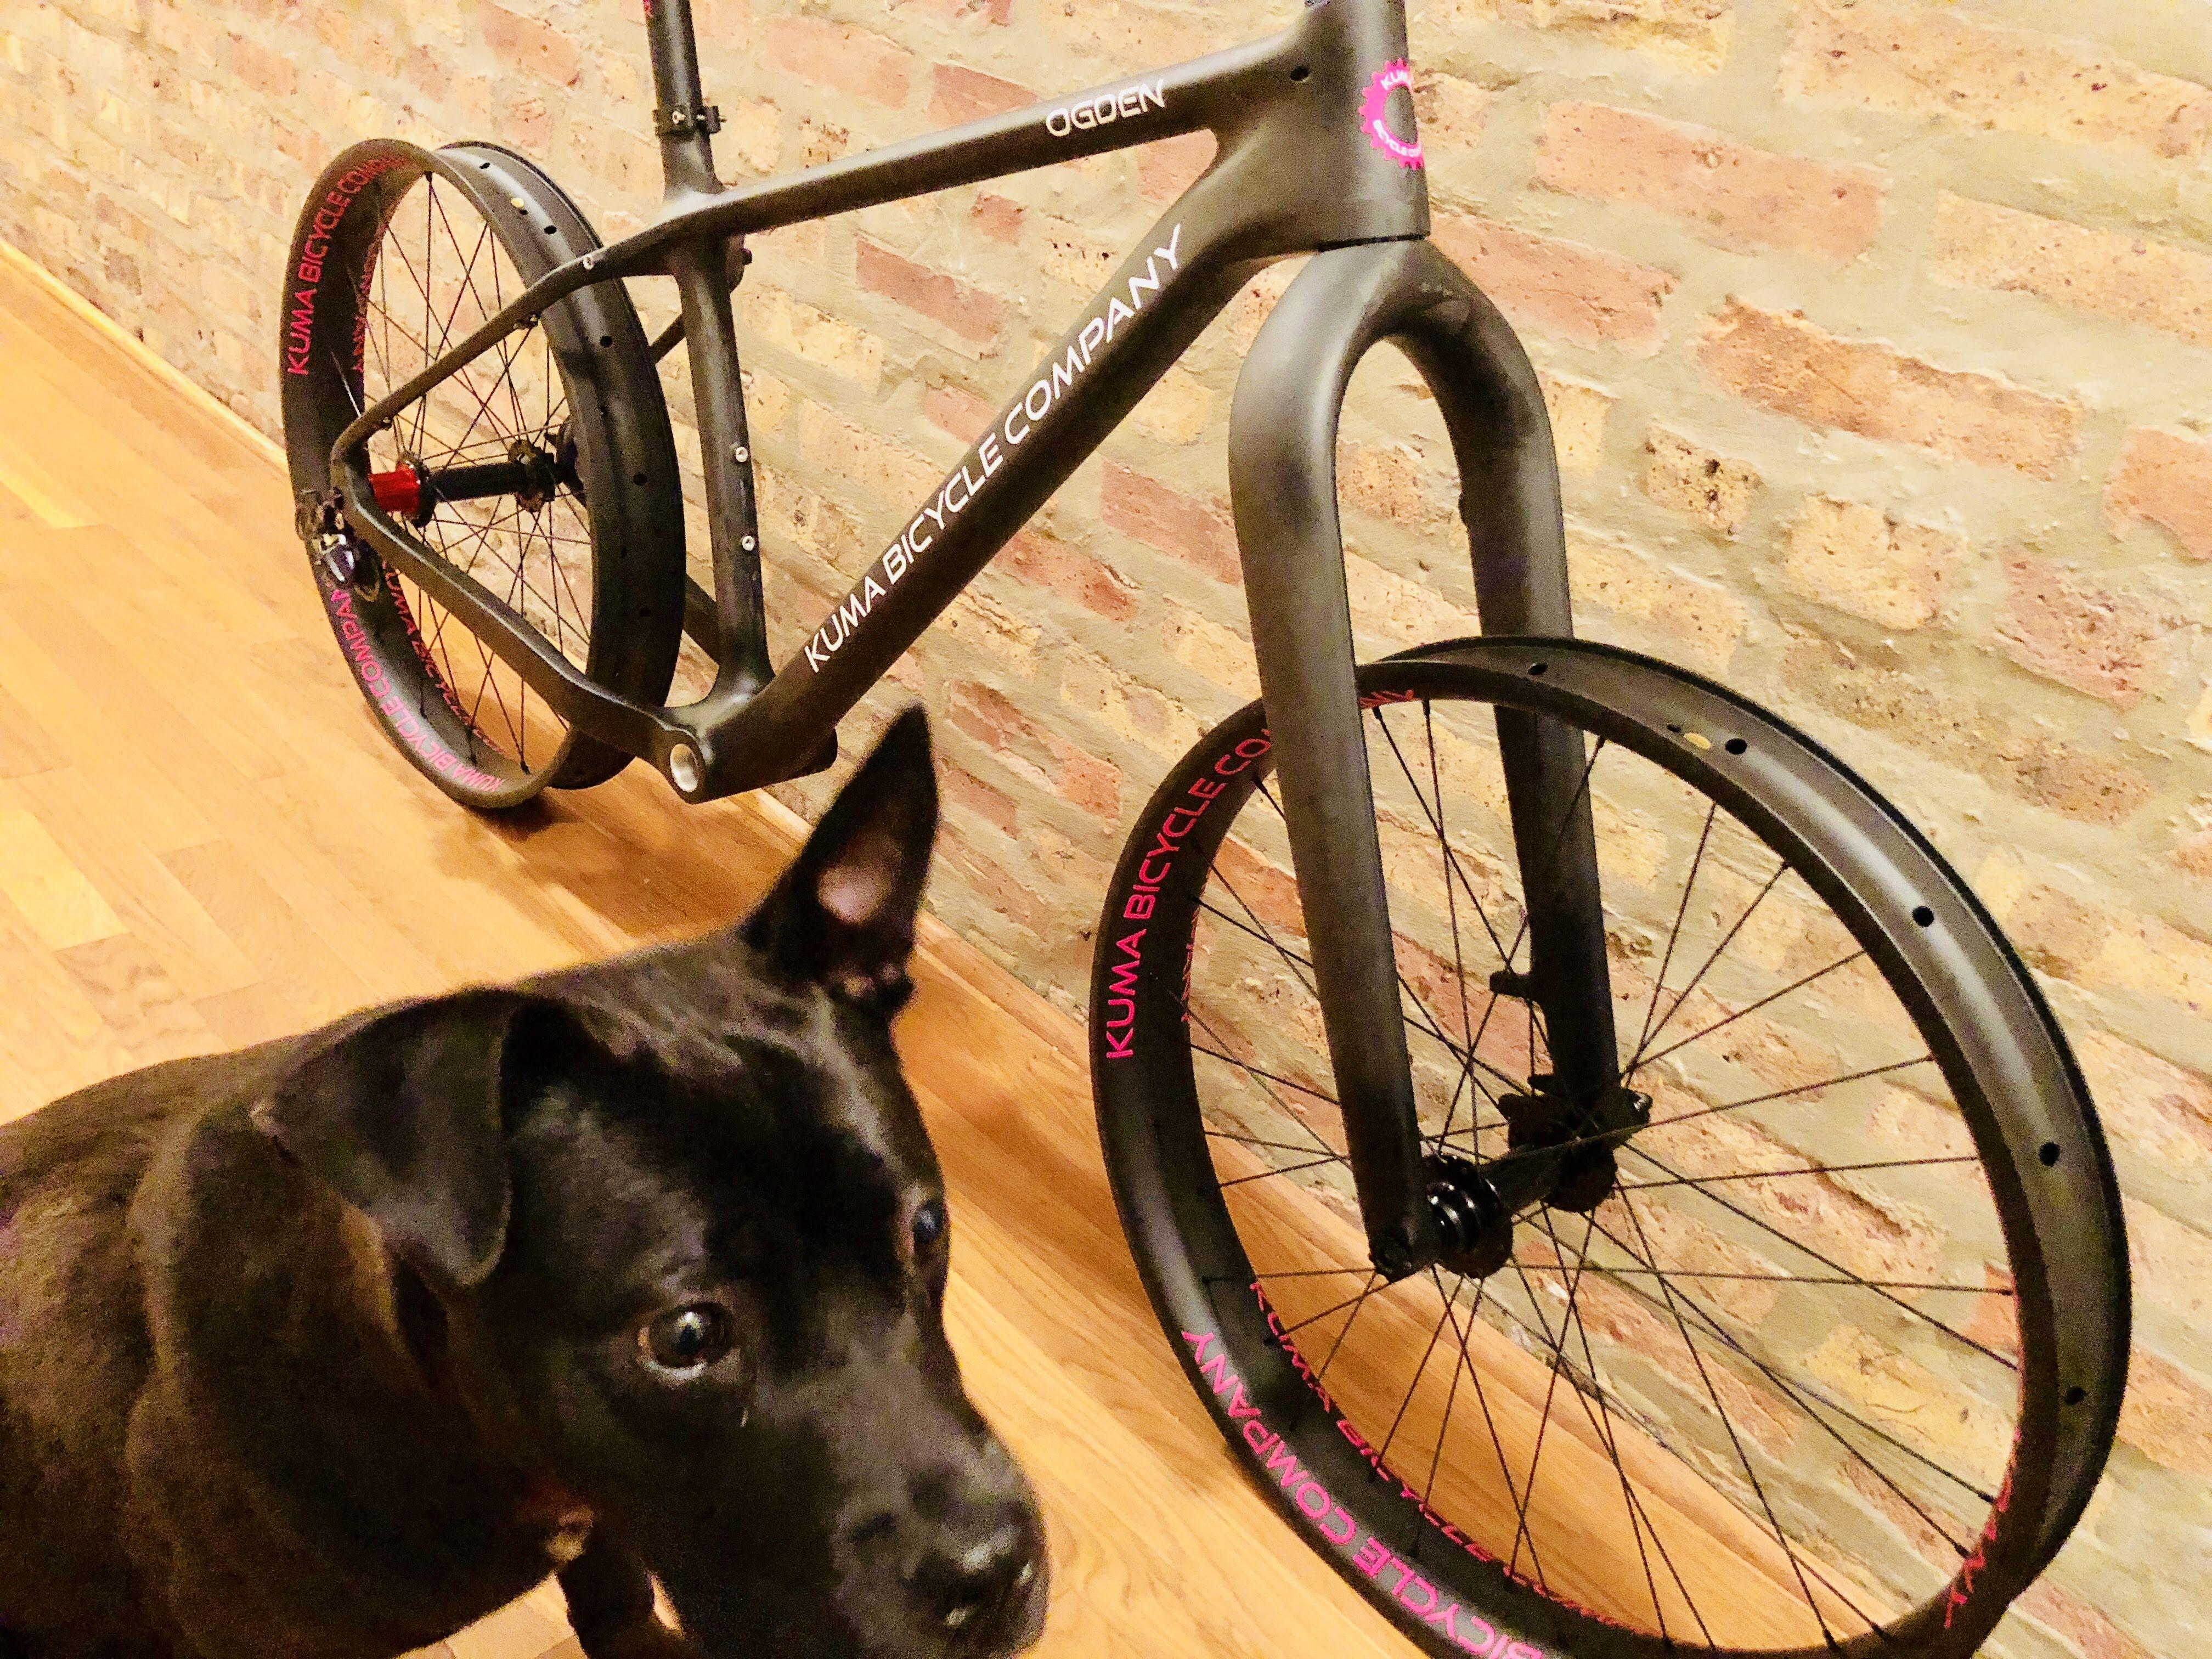 Ogden Fat Bike